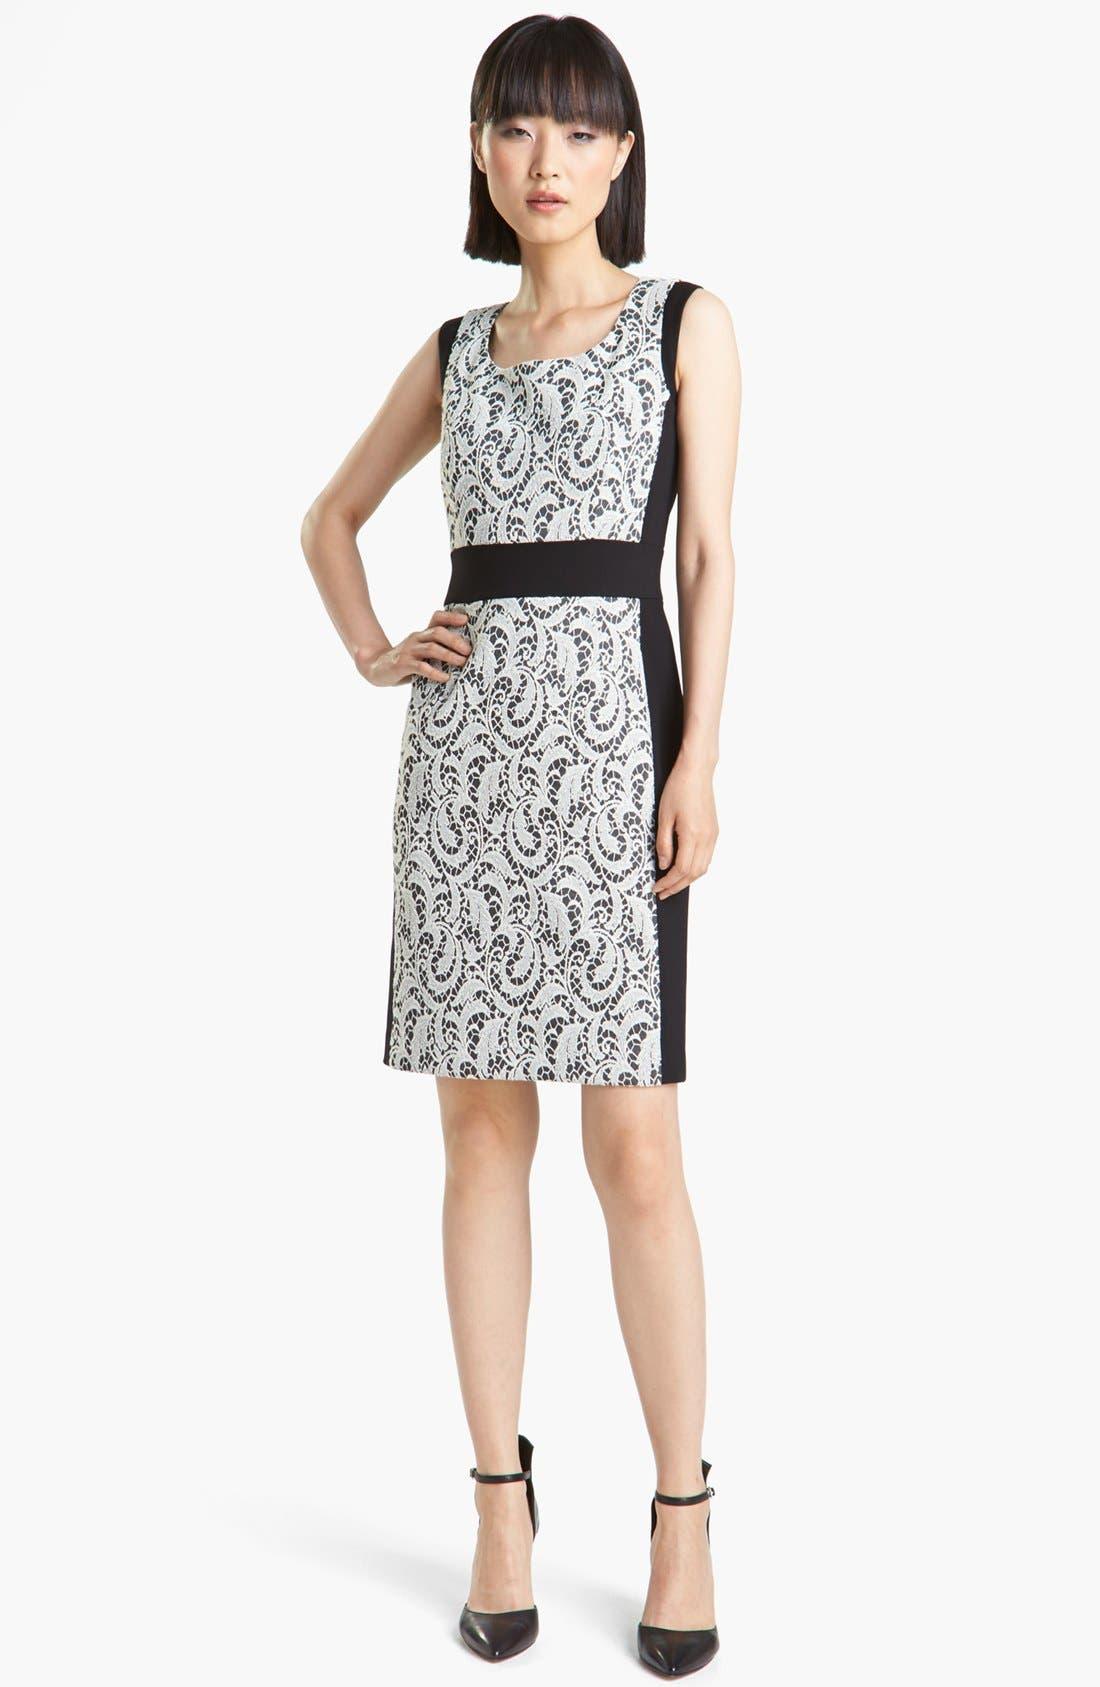 Alternate Image 1 Selected - Lafayette 148 New York 'Ansel - Chantilly Jacquard' Dress